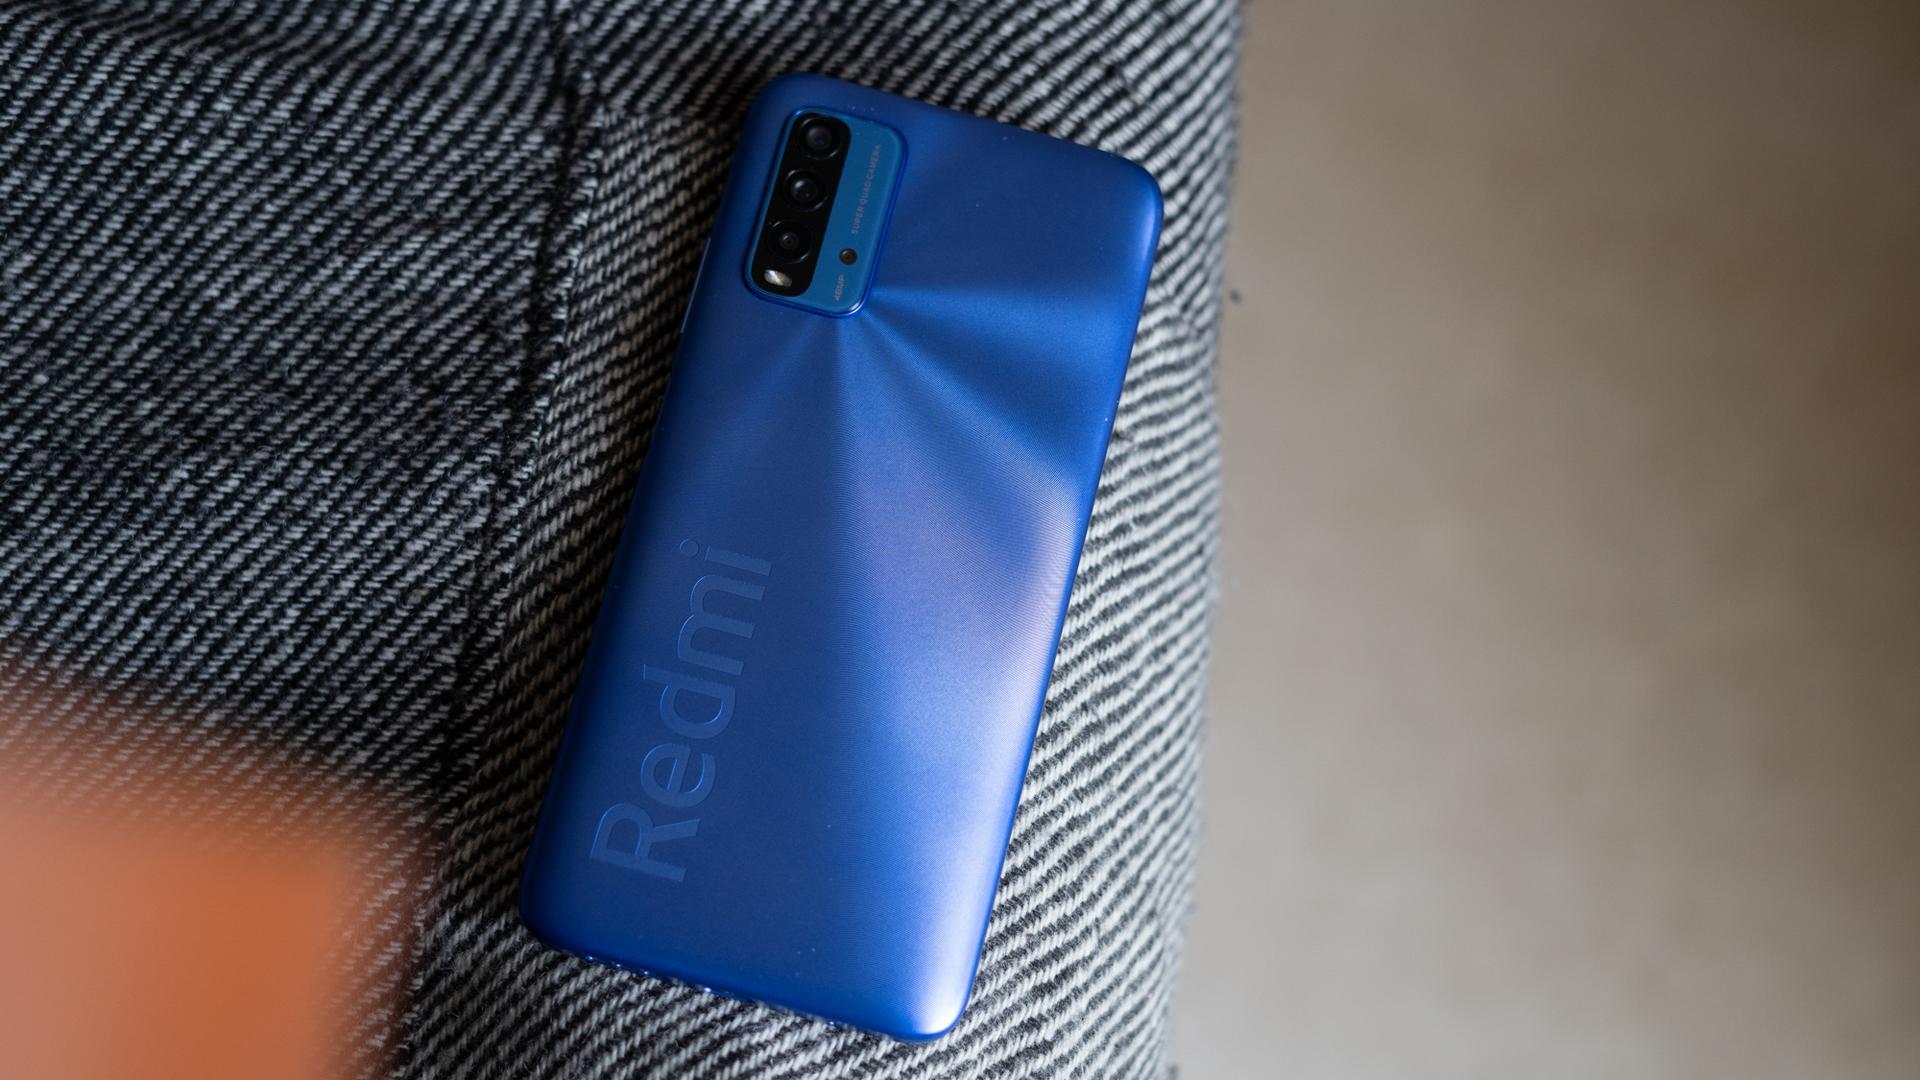 Redmi 9 Power profile shot